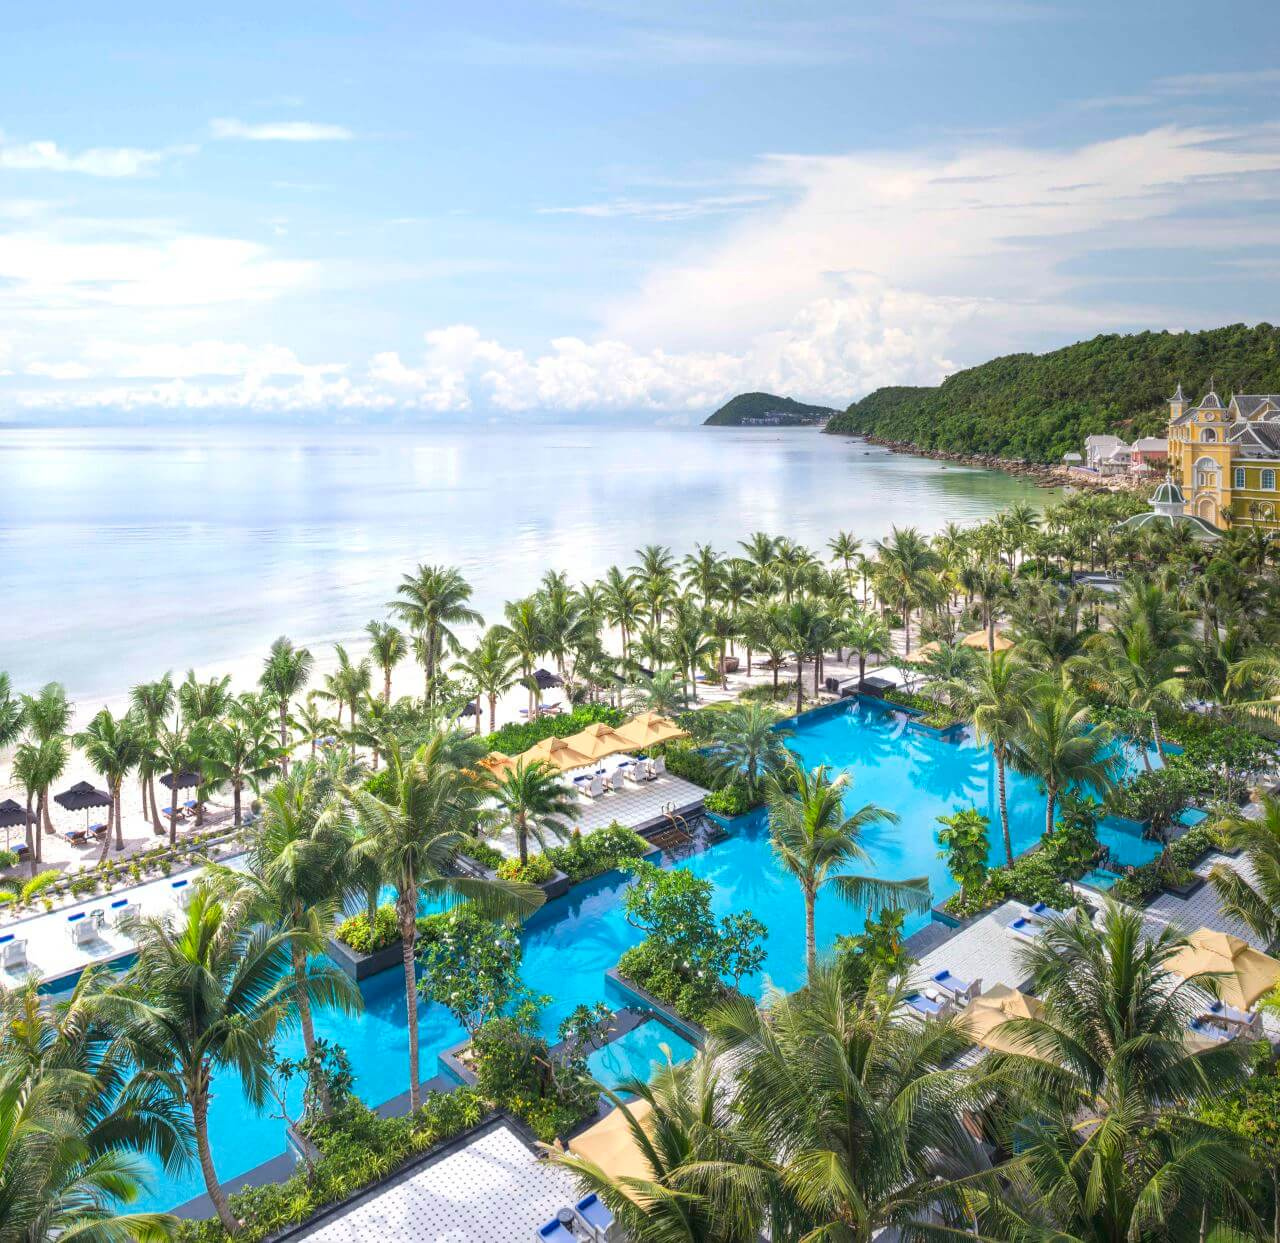 JW Marriott Phu Quoc Emerald Bay Pool